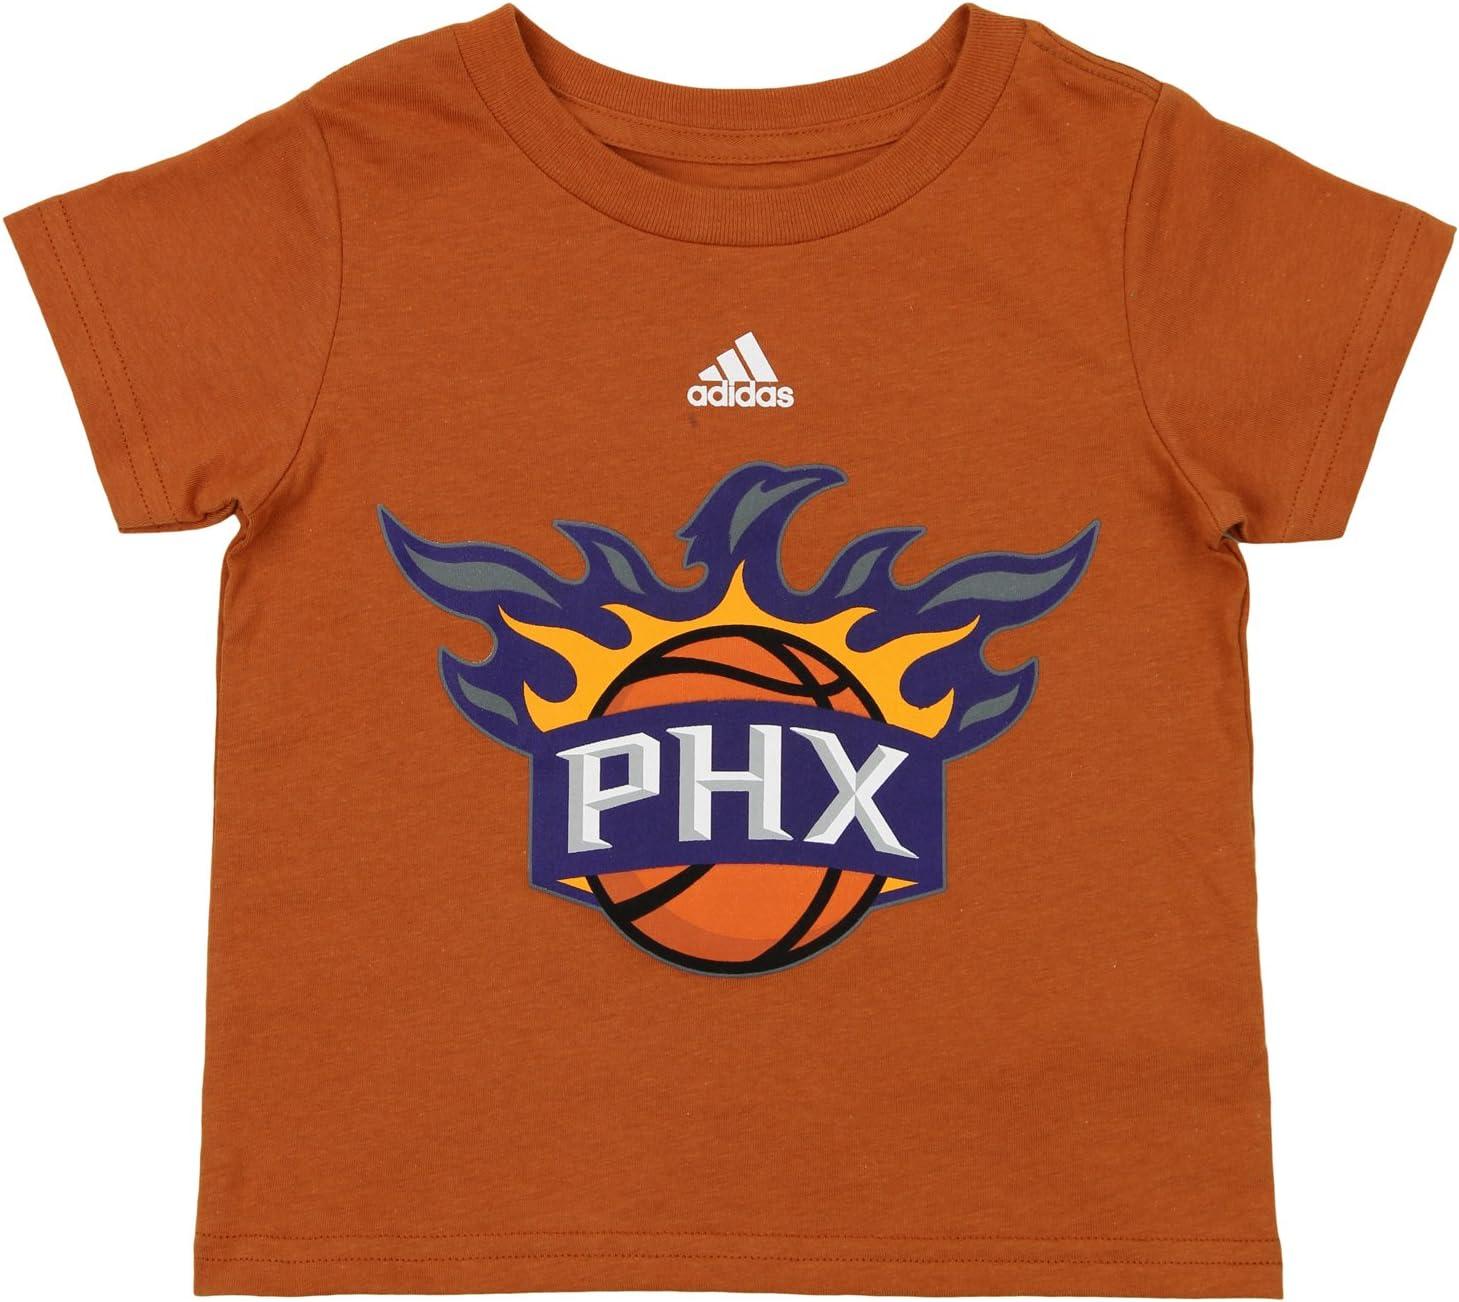 adidas NBA Camiseta de Manga Corta con Logotipo de Phoenix Suns ...